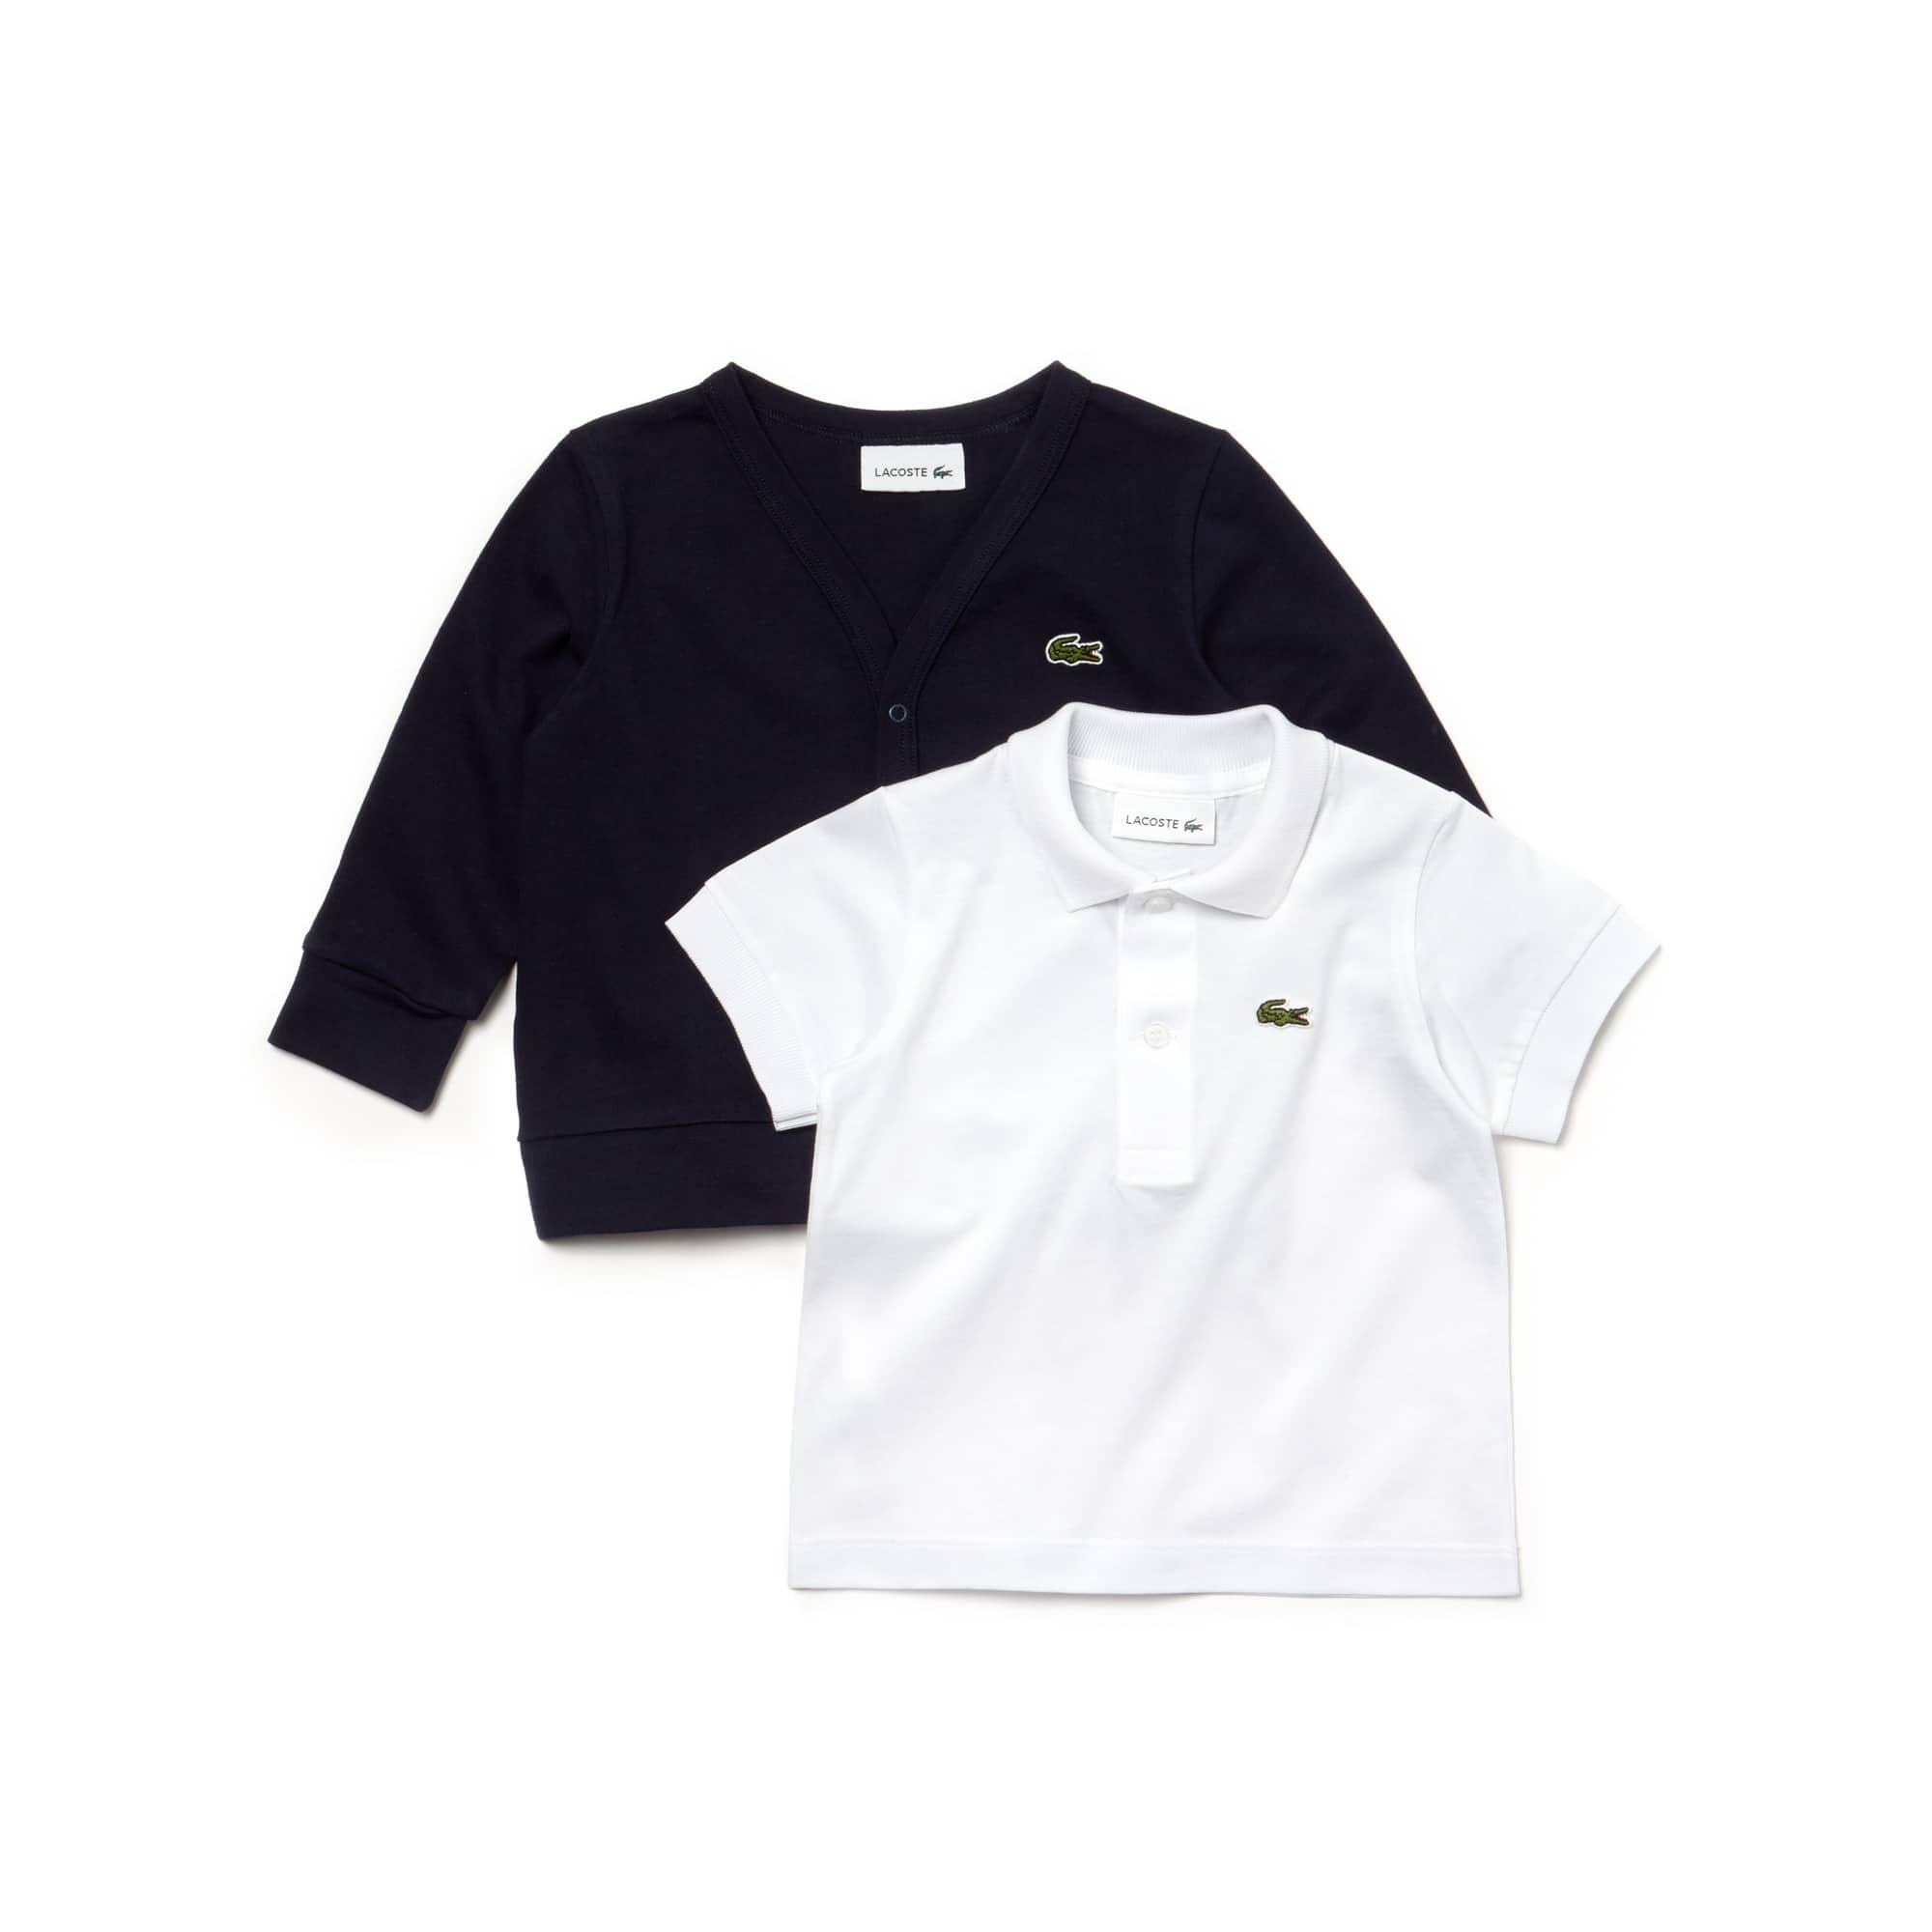 Cofanetto regalo Bambino polo e cardigan in jersey di cotone tinta unita